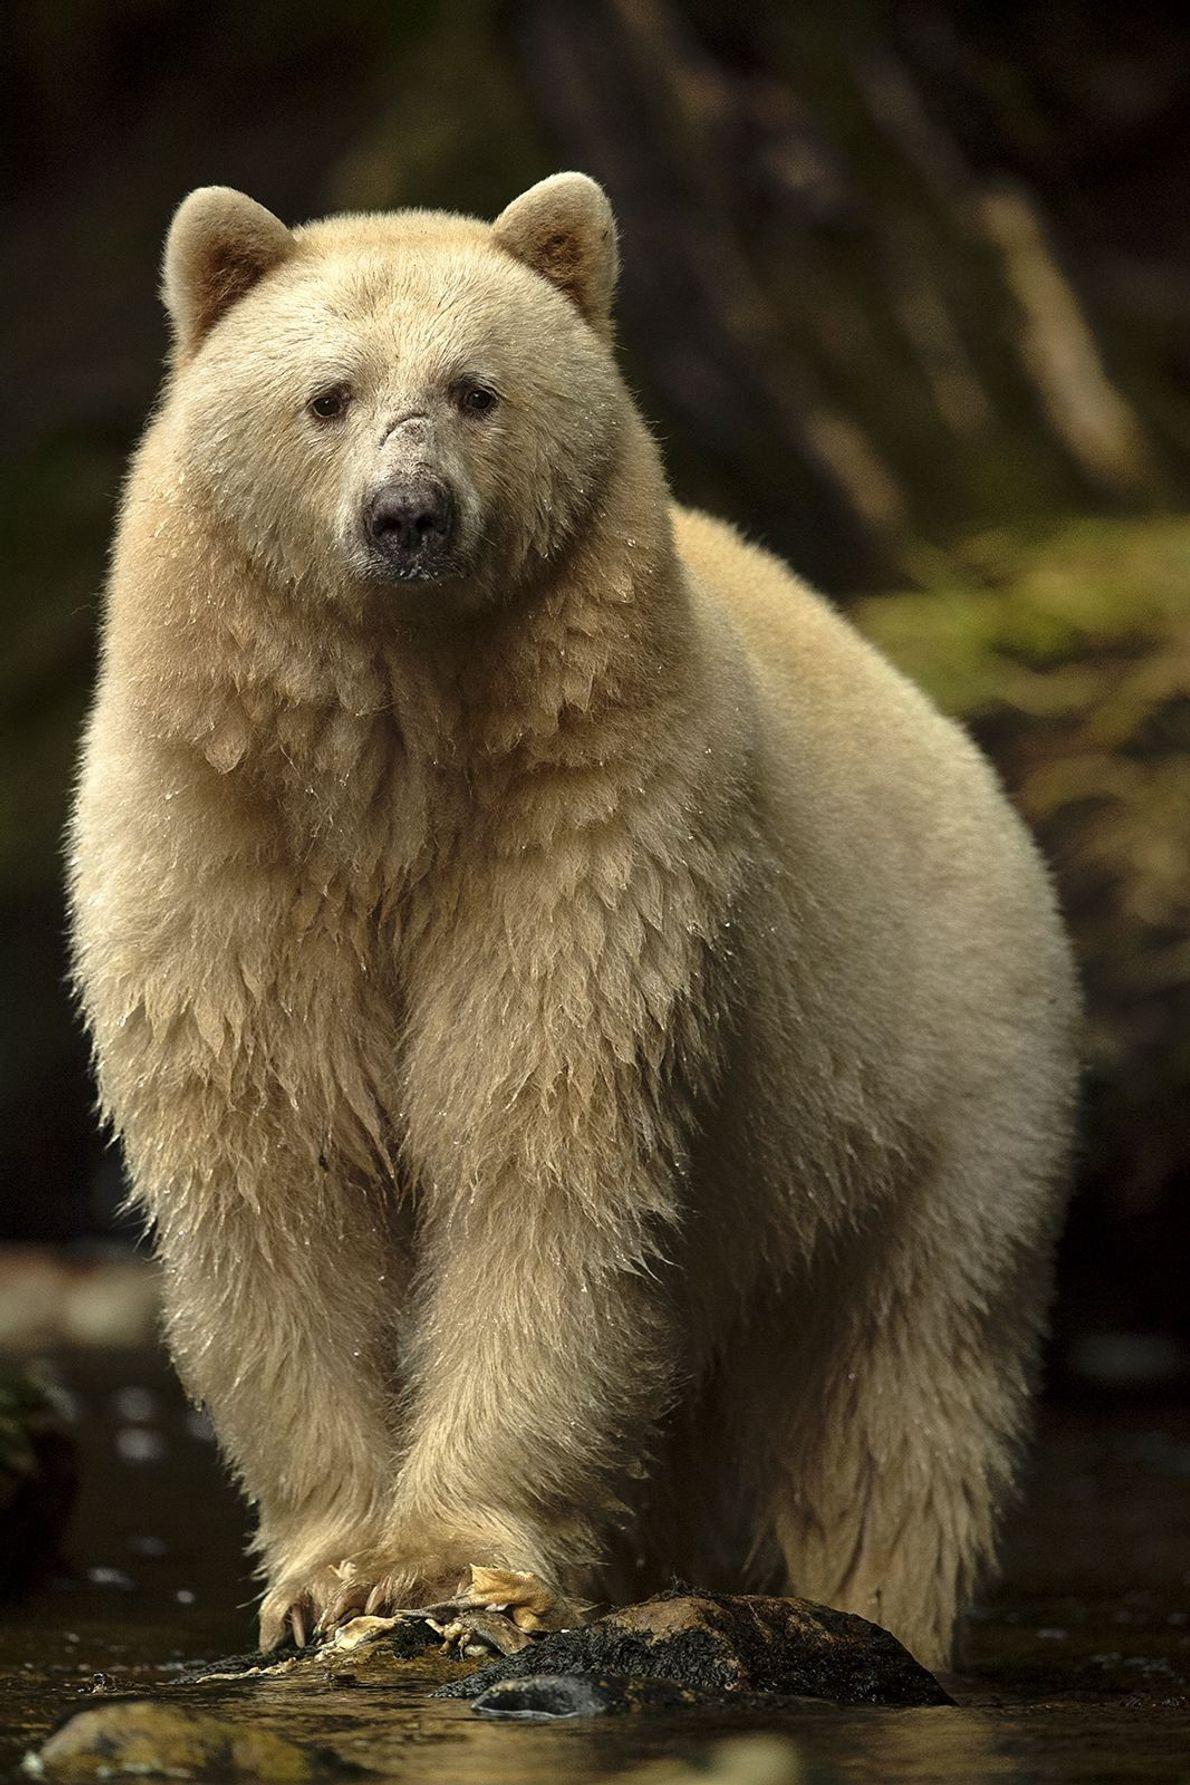 FLORESTA TROPICAL GREAT BEAR, COLÚMBIA BRITÂNICA